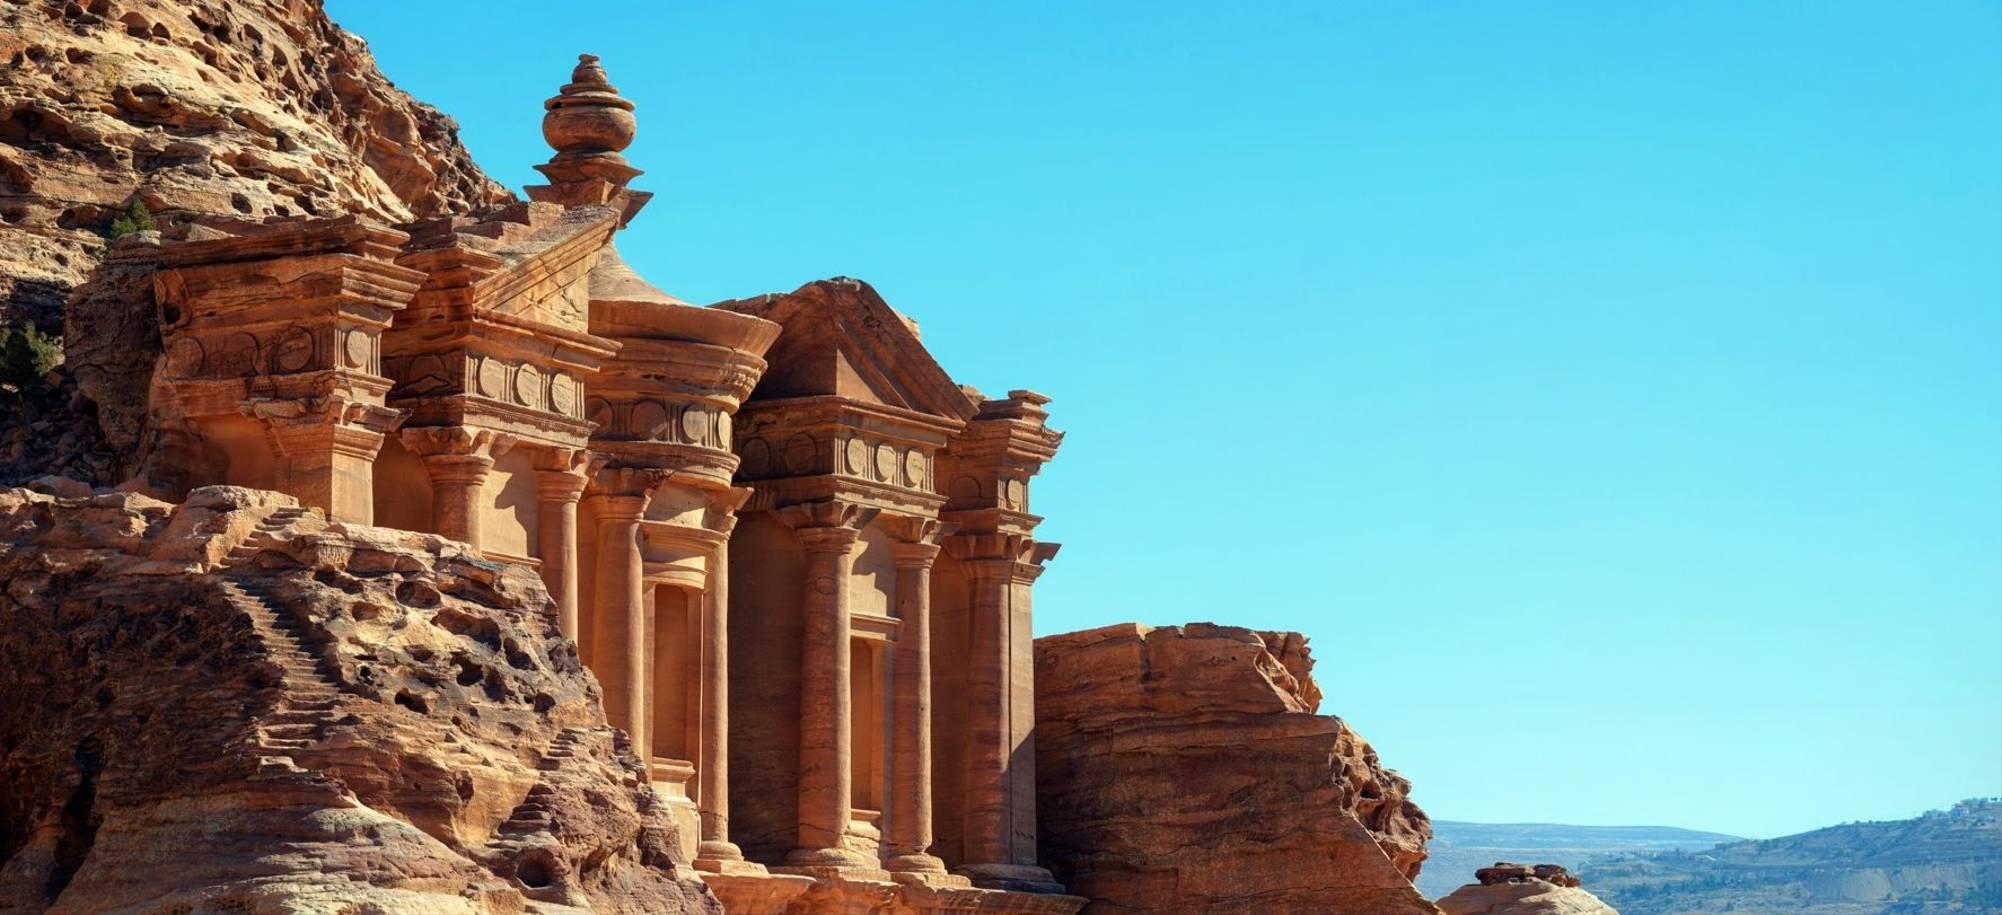 18 Day - Aqaba, Petra - Itinerary Desktop.jpg